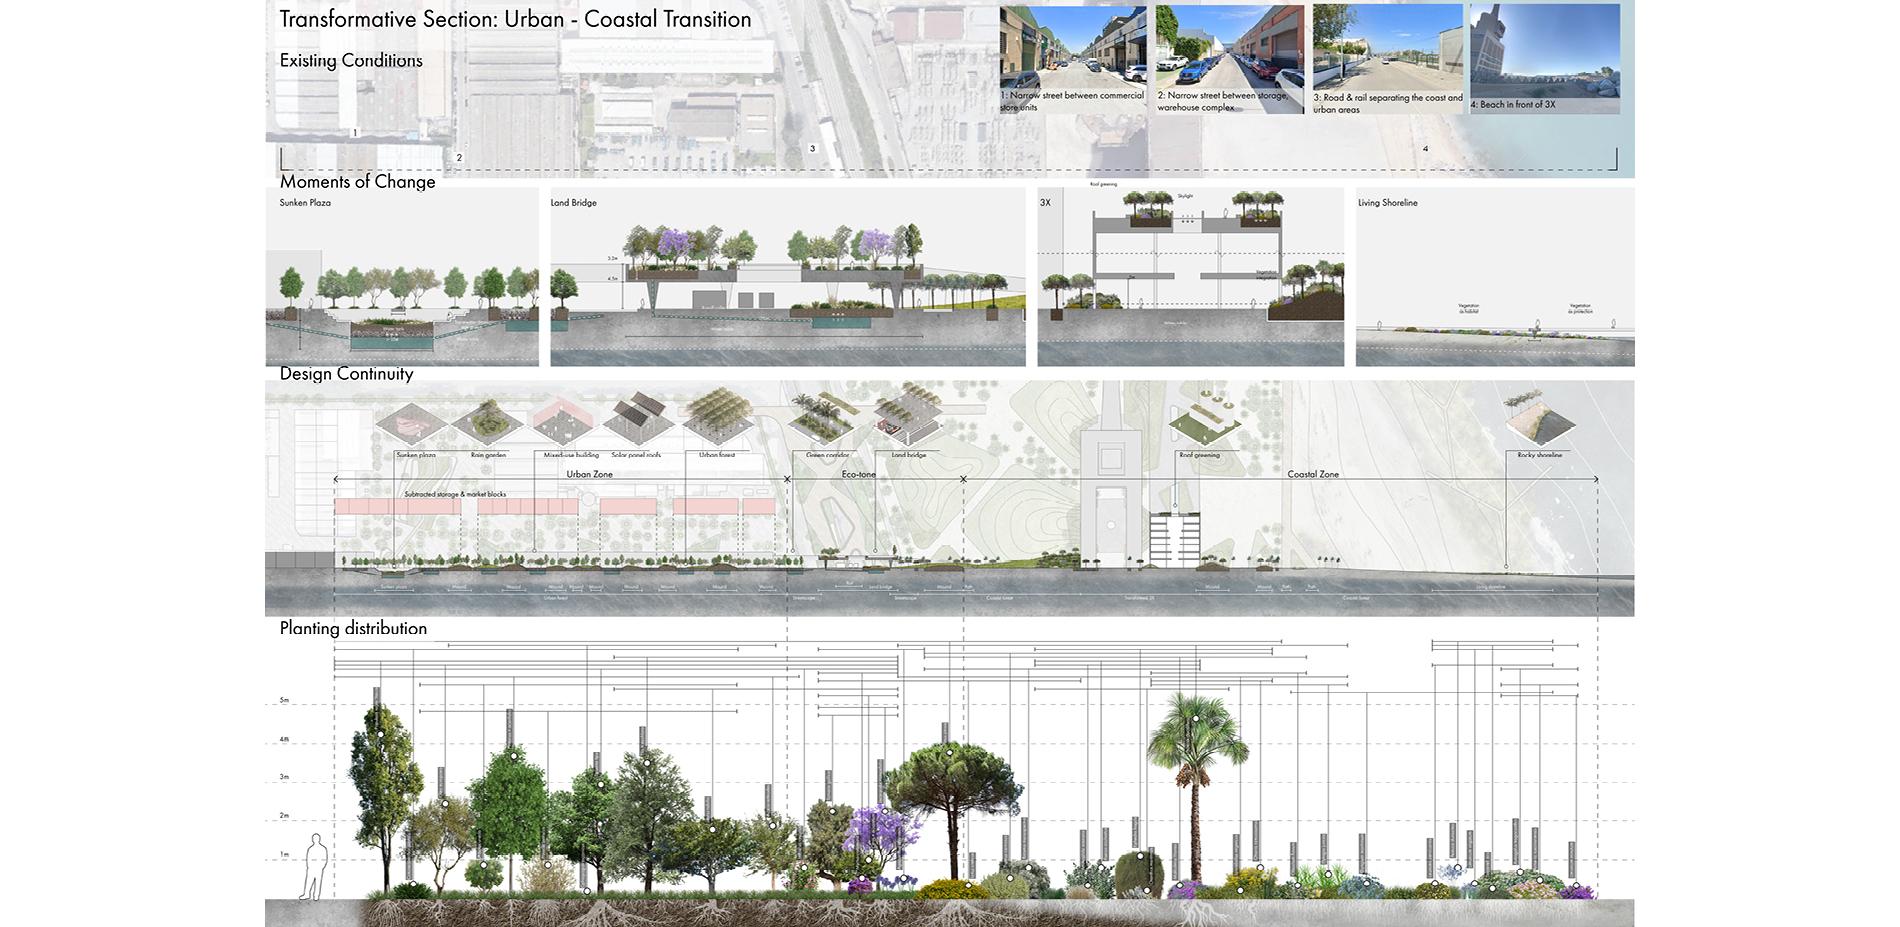 Transformative Section: Urban - Coastal Transition